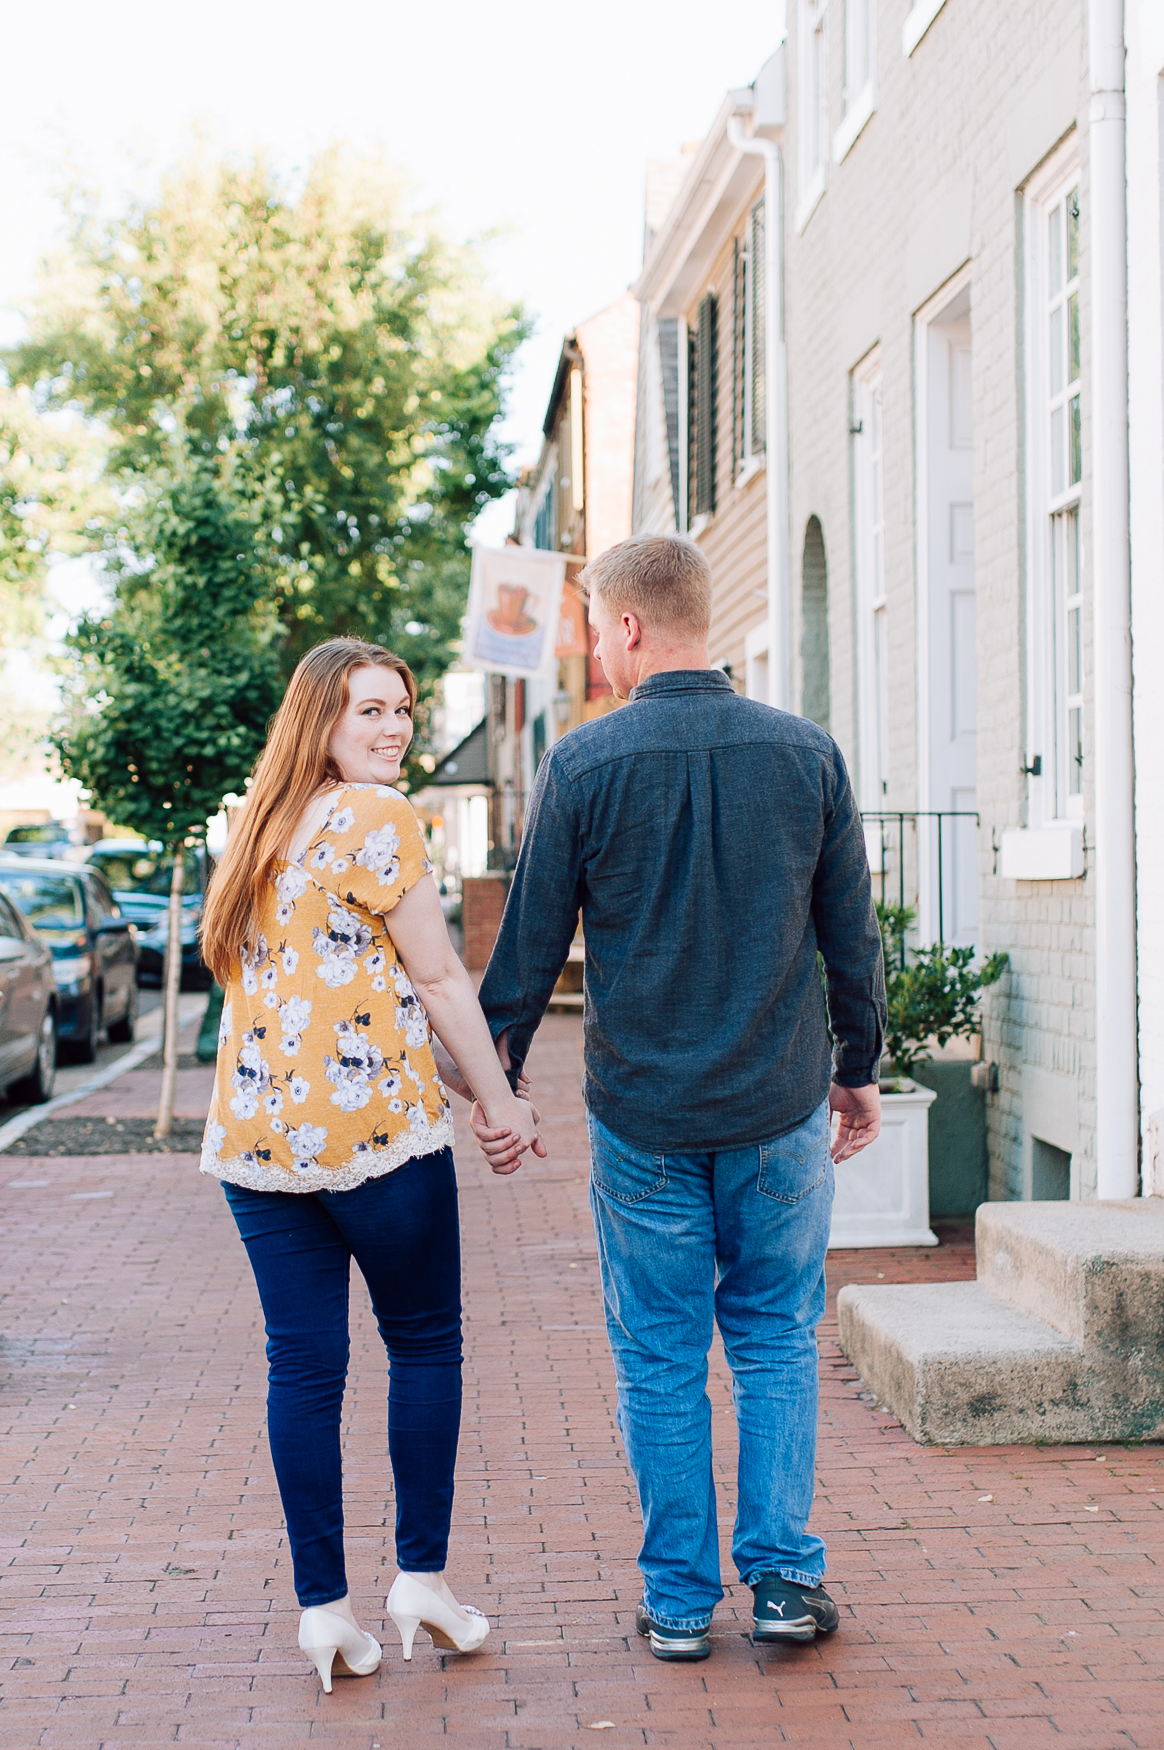 engagement_downtown_fredericksburg_virginiaweddingphotographer_youseephotography_ErinBrad (9).jpg